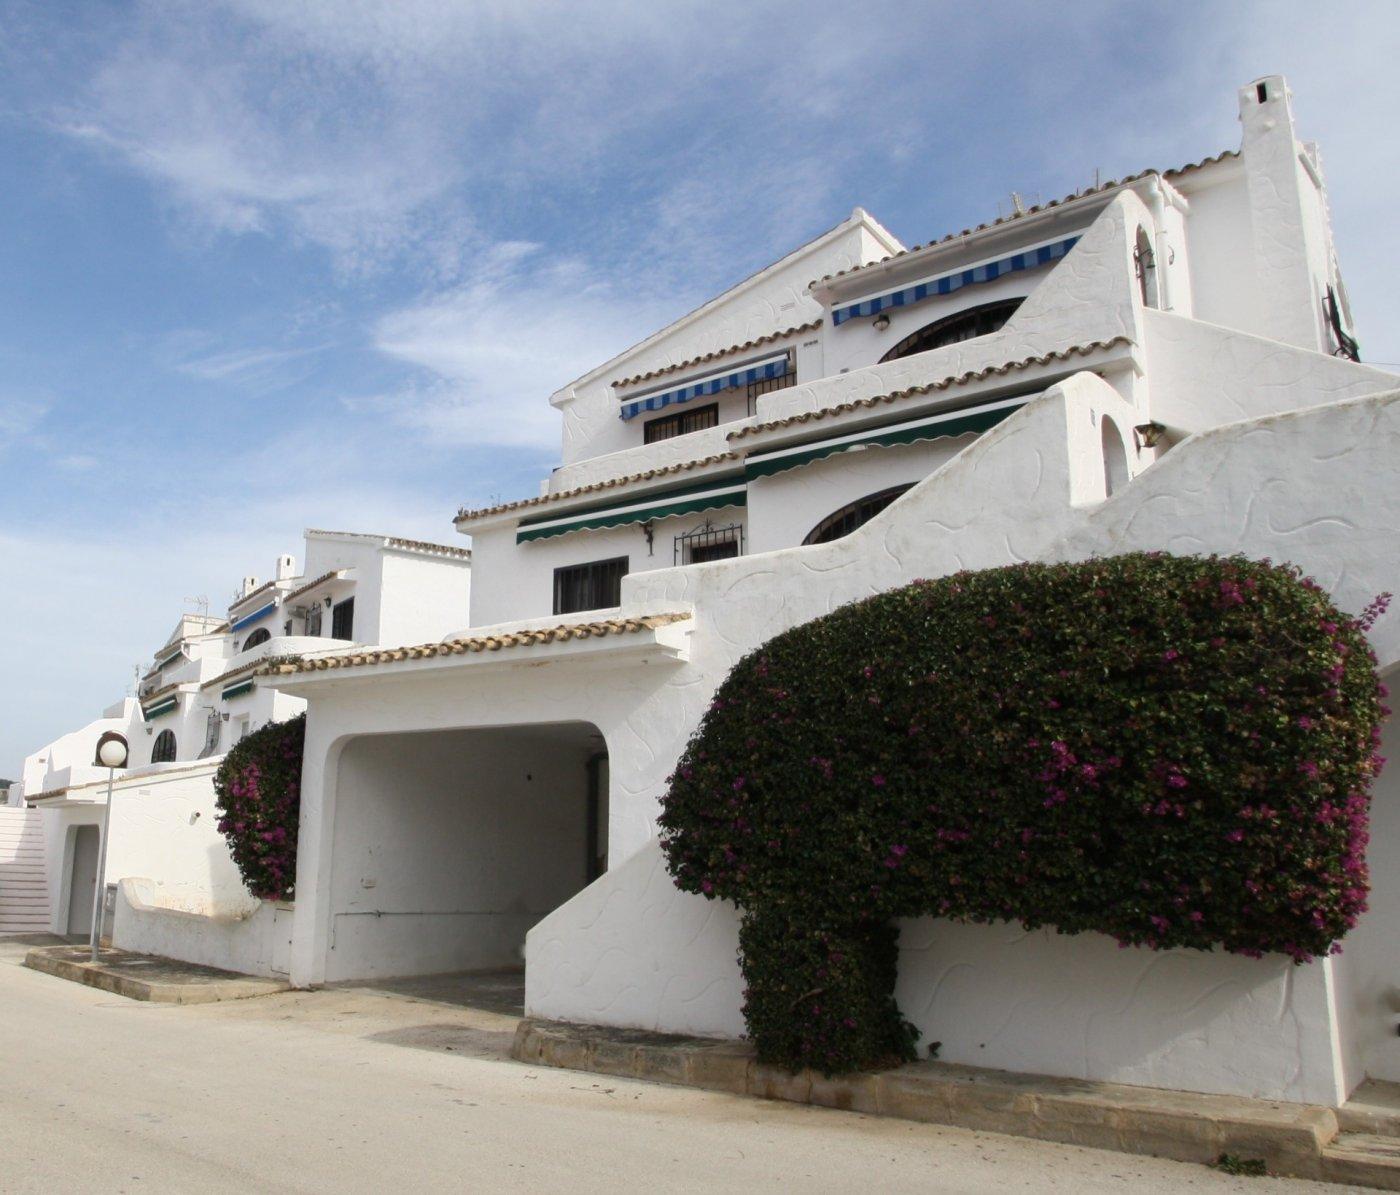 bungalow en benitachell · villotel 160000€